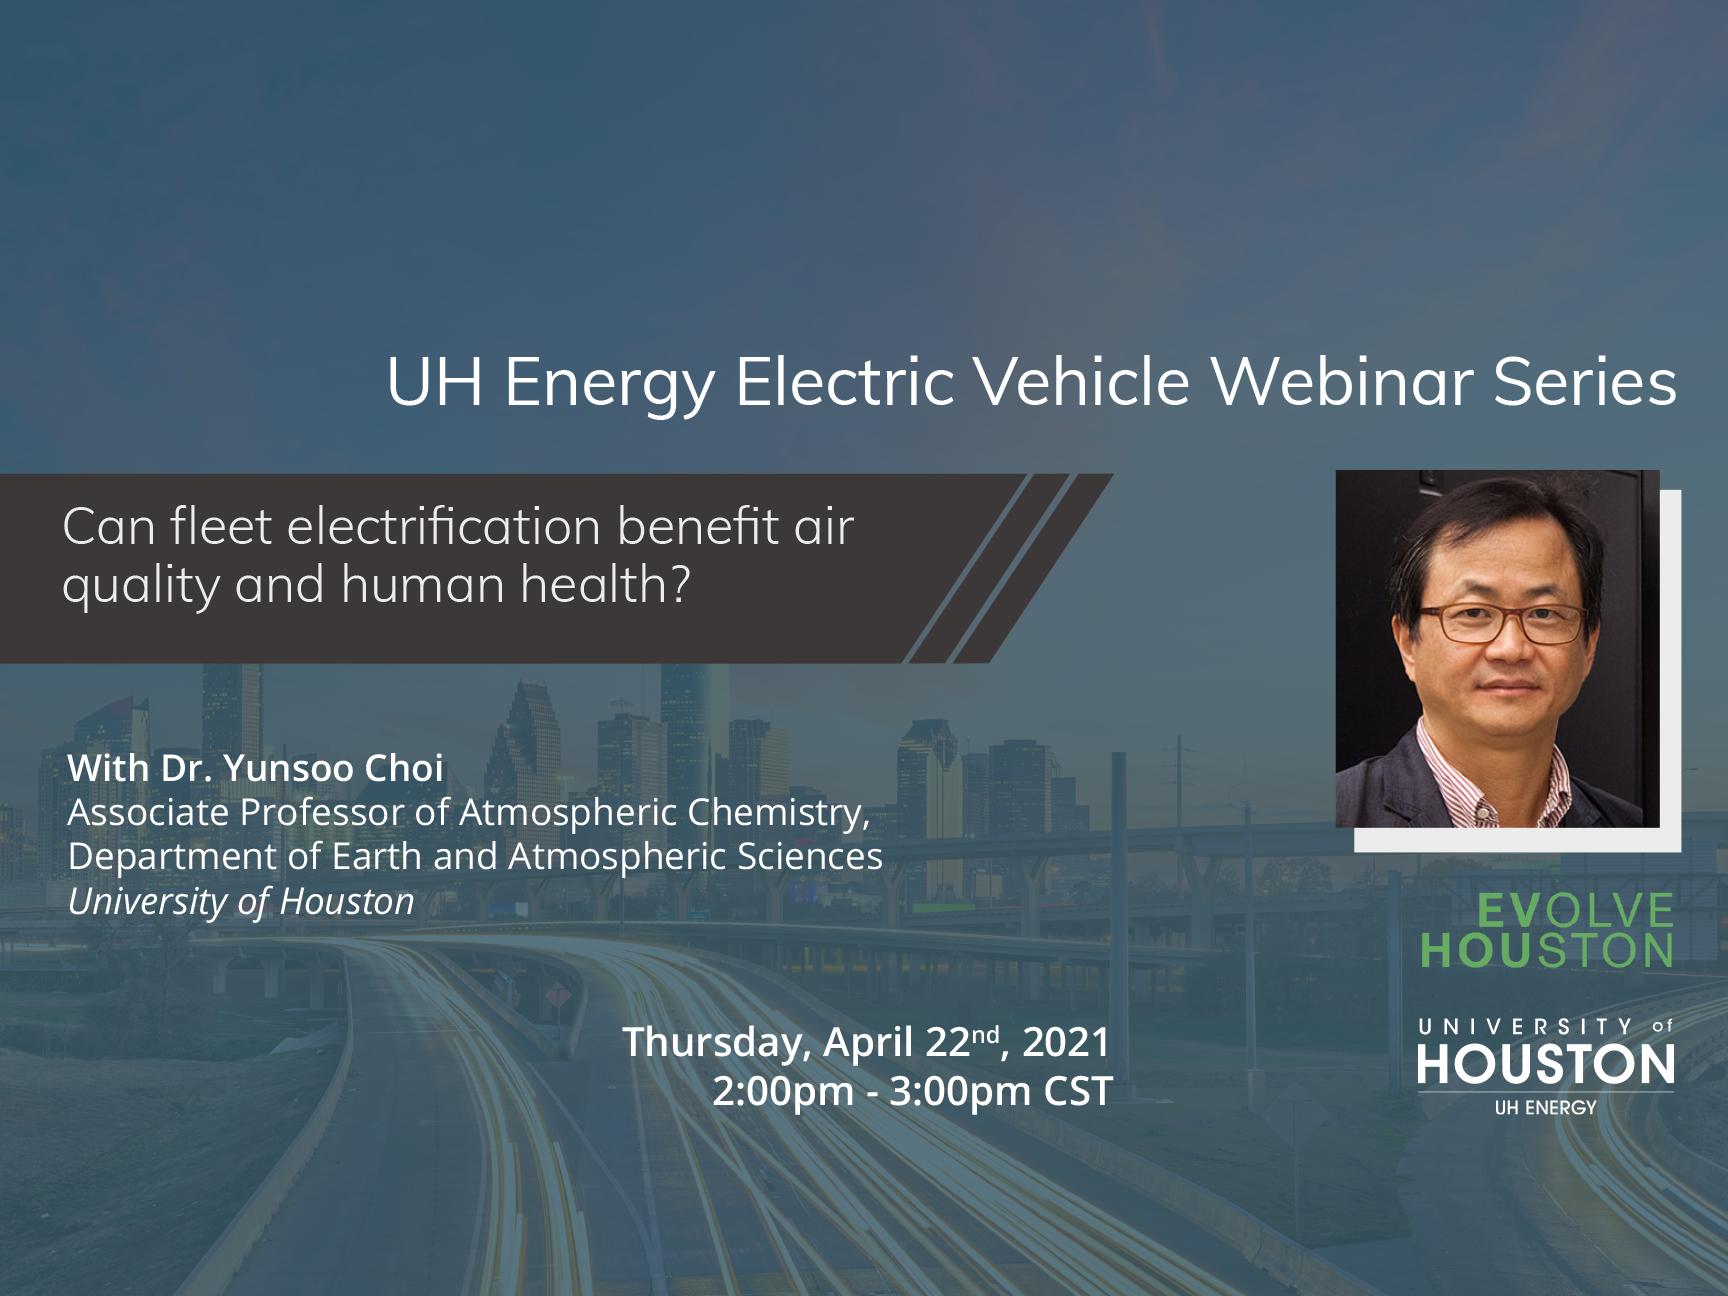 EV Webinar Series: Can fleet electrification benefit air quality and human health? Image